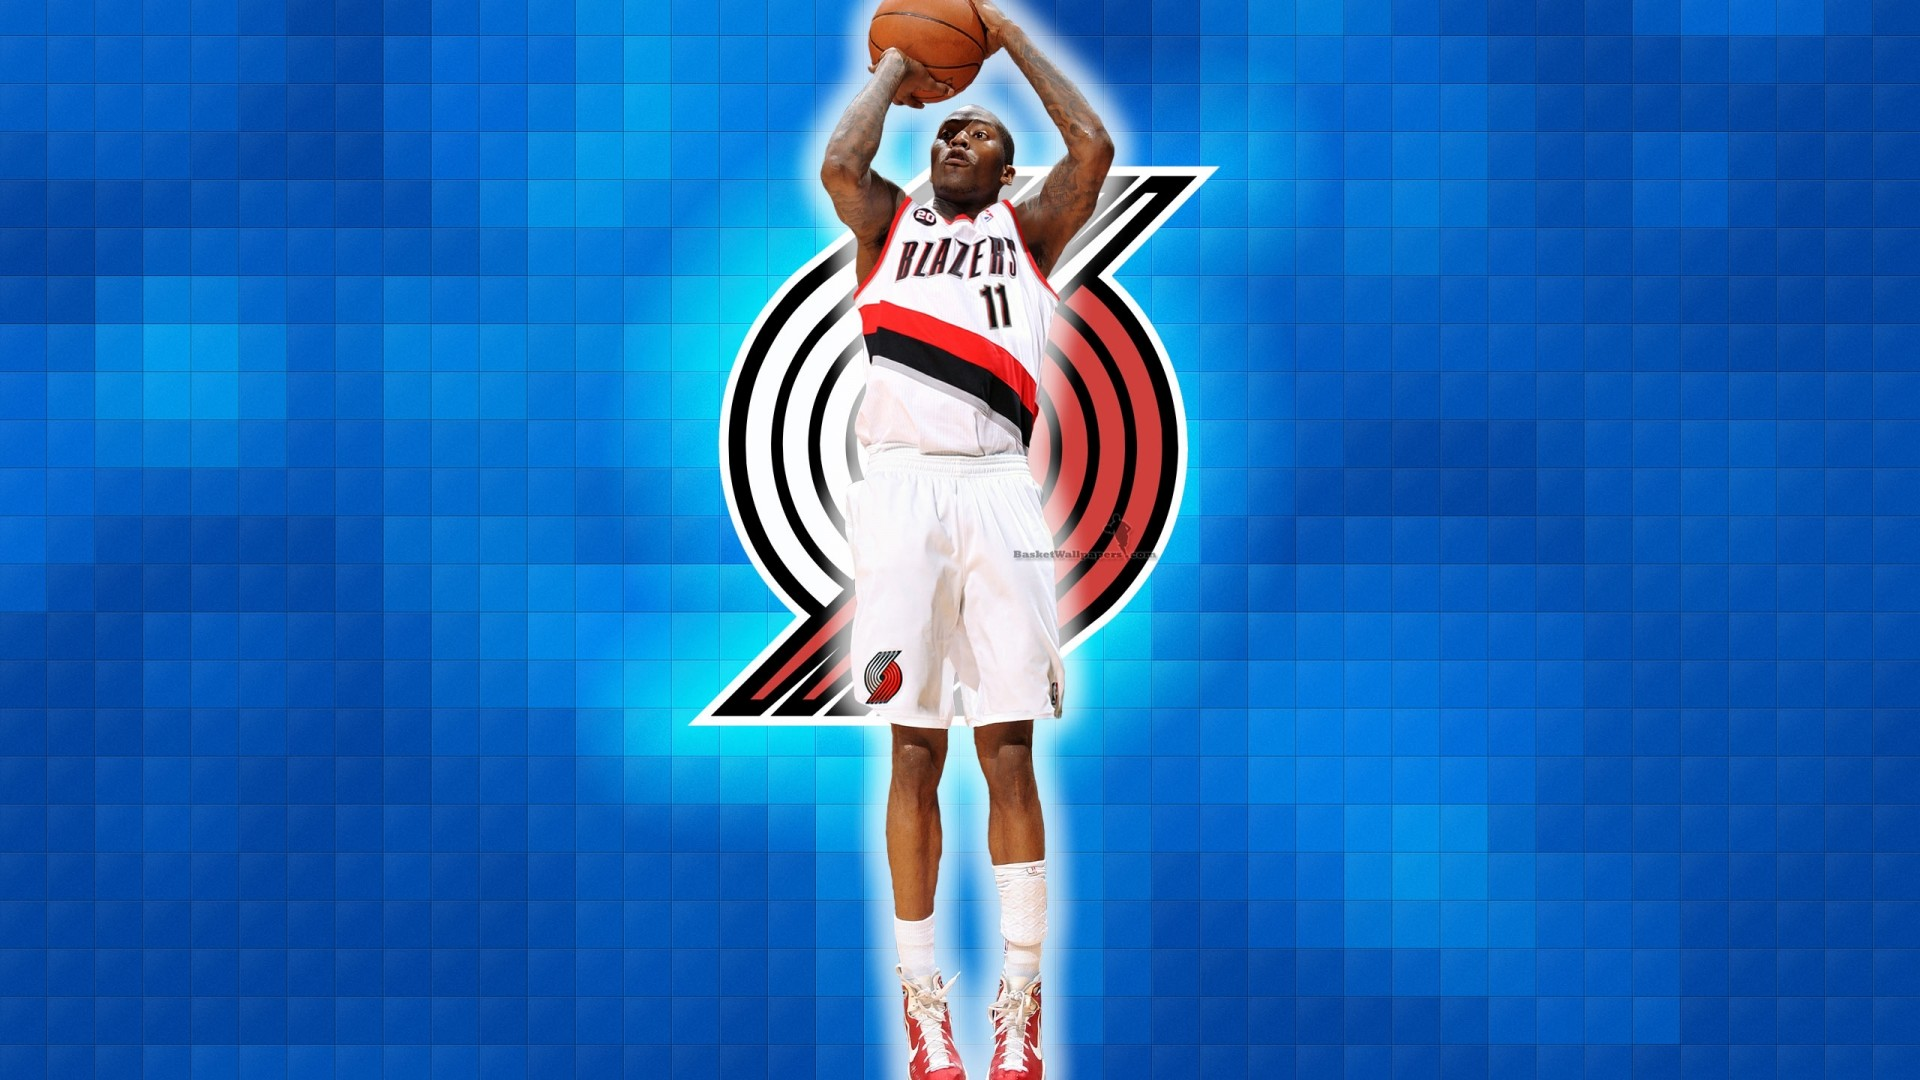 Jamal Crawford Blazers basketball wallpaper